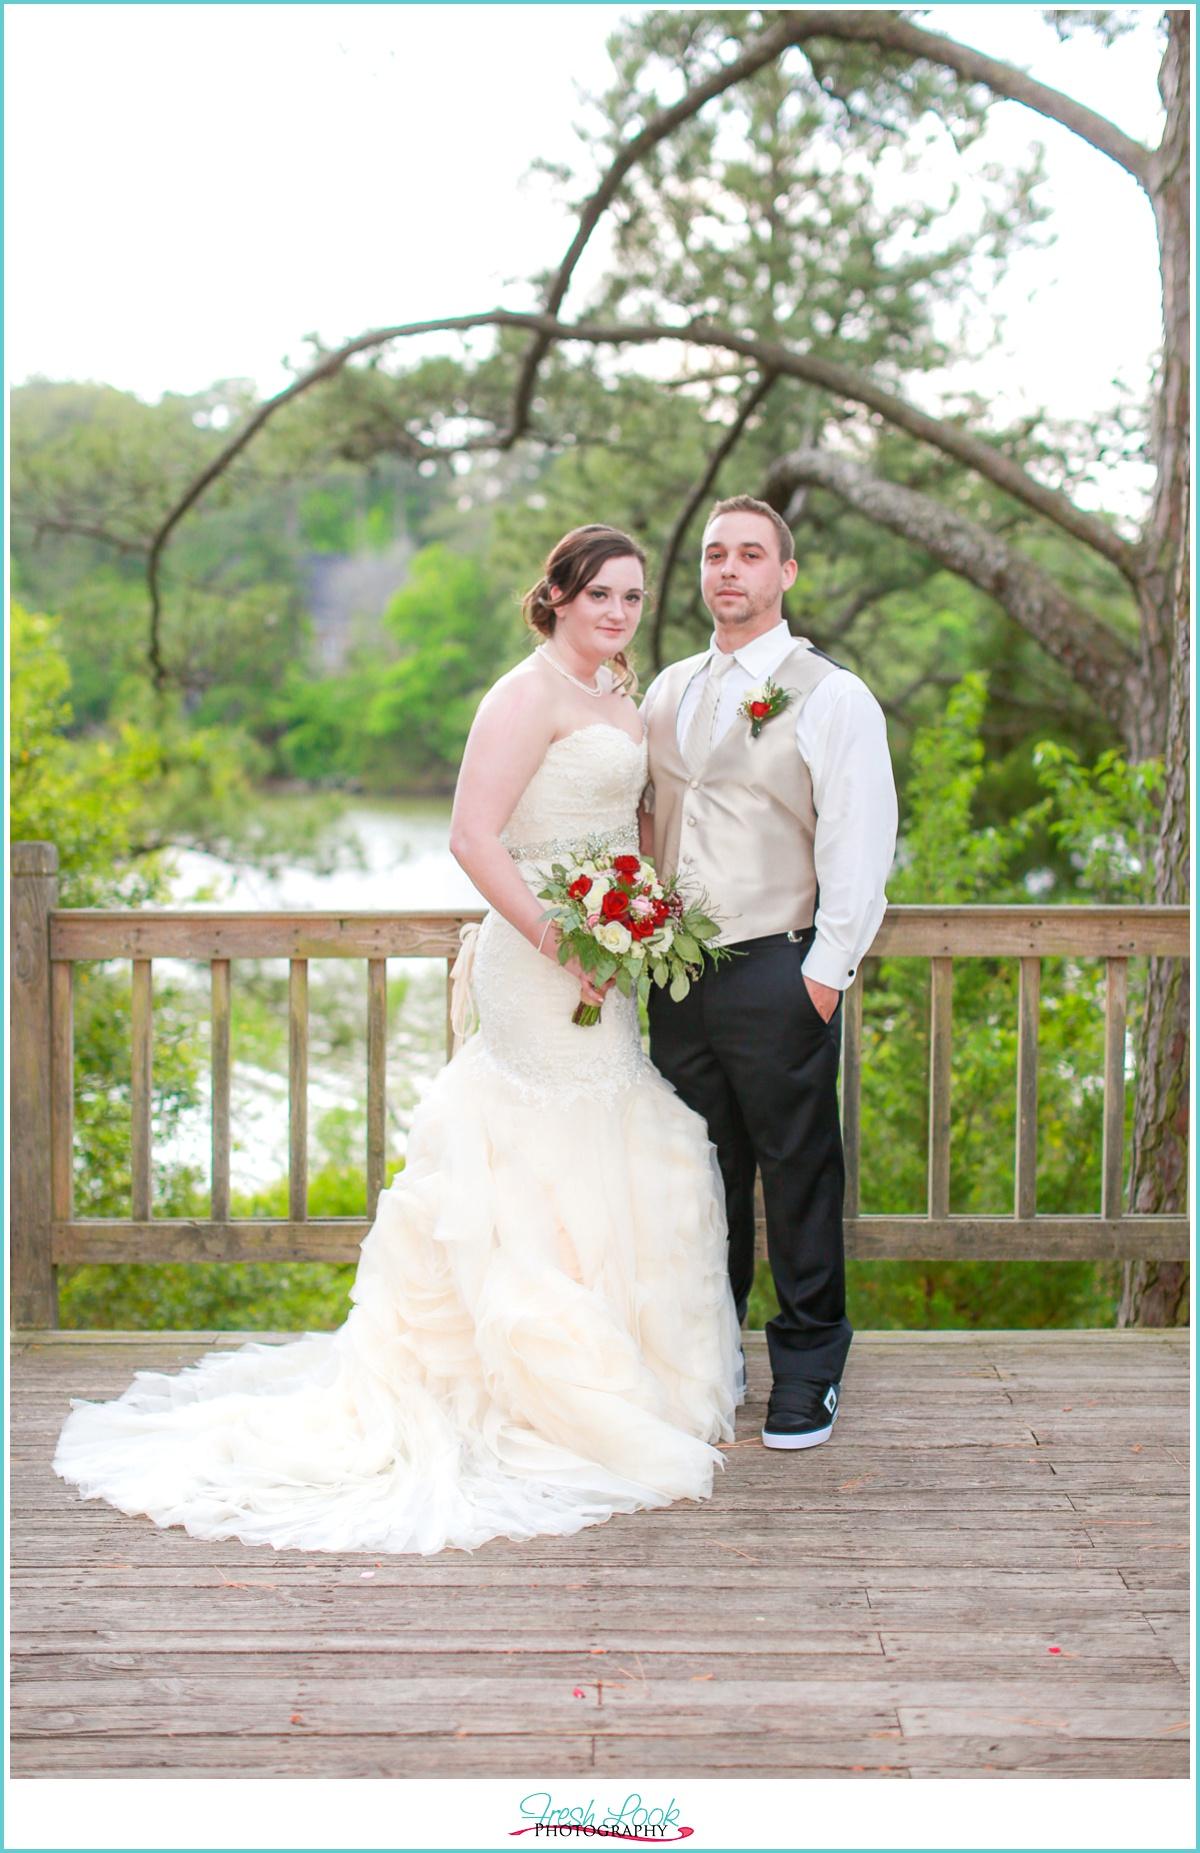 Virginia Beach Bride and groom